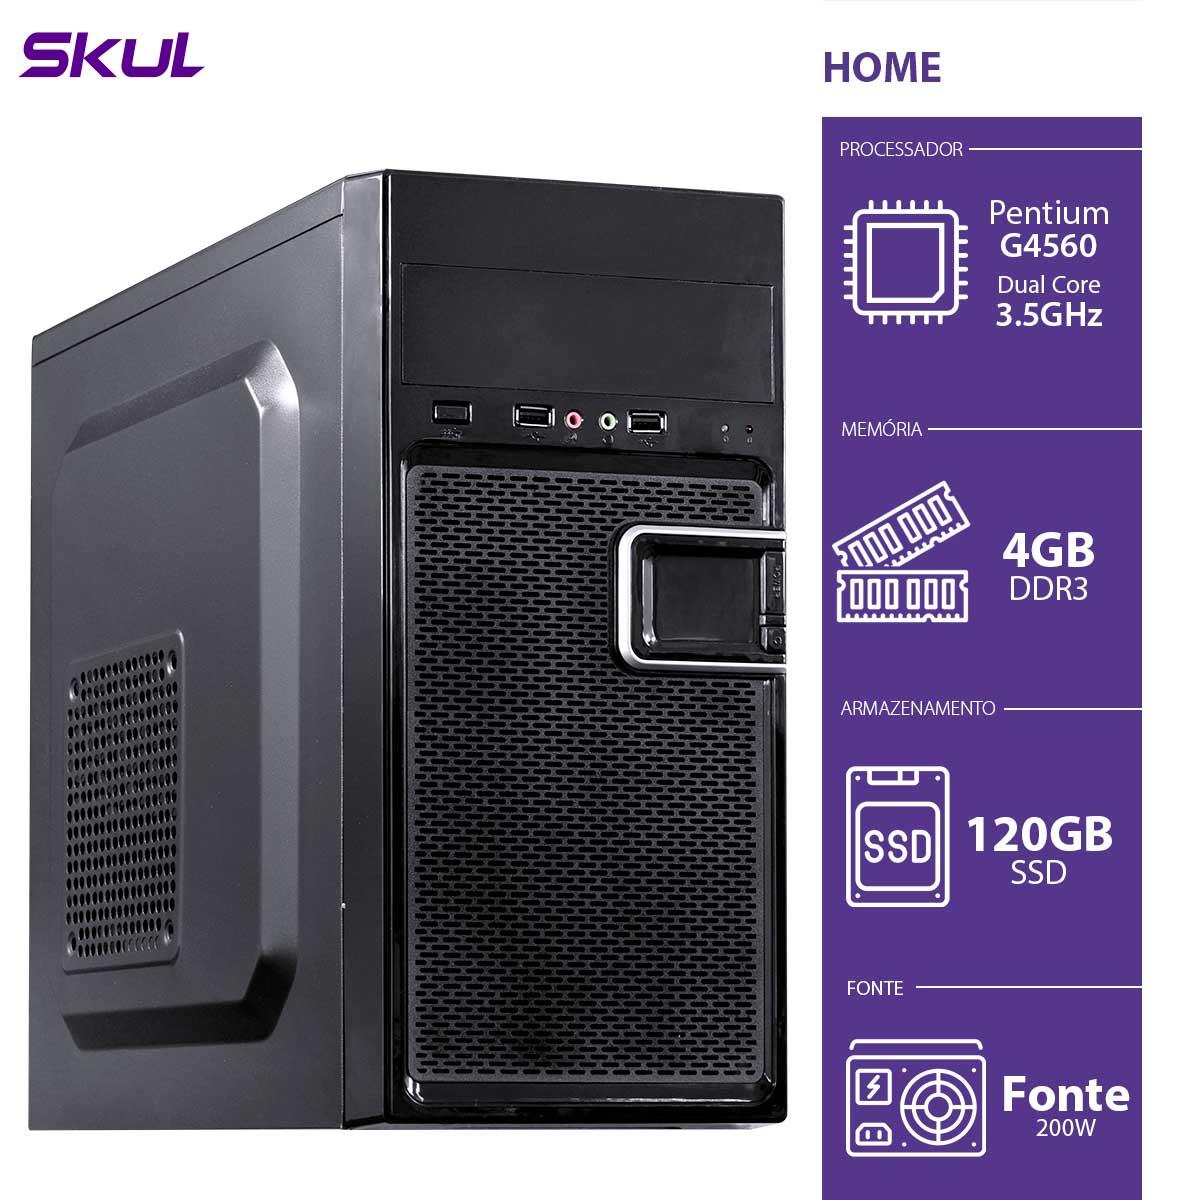 Computador Home H200 - Pentium Dual Core G4560 3.5GHZ 4GB DDR3 SSD 120GB HDMI/VGA Fonte 200W - HG45601204D3 - SKUL